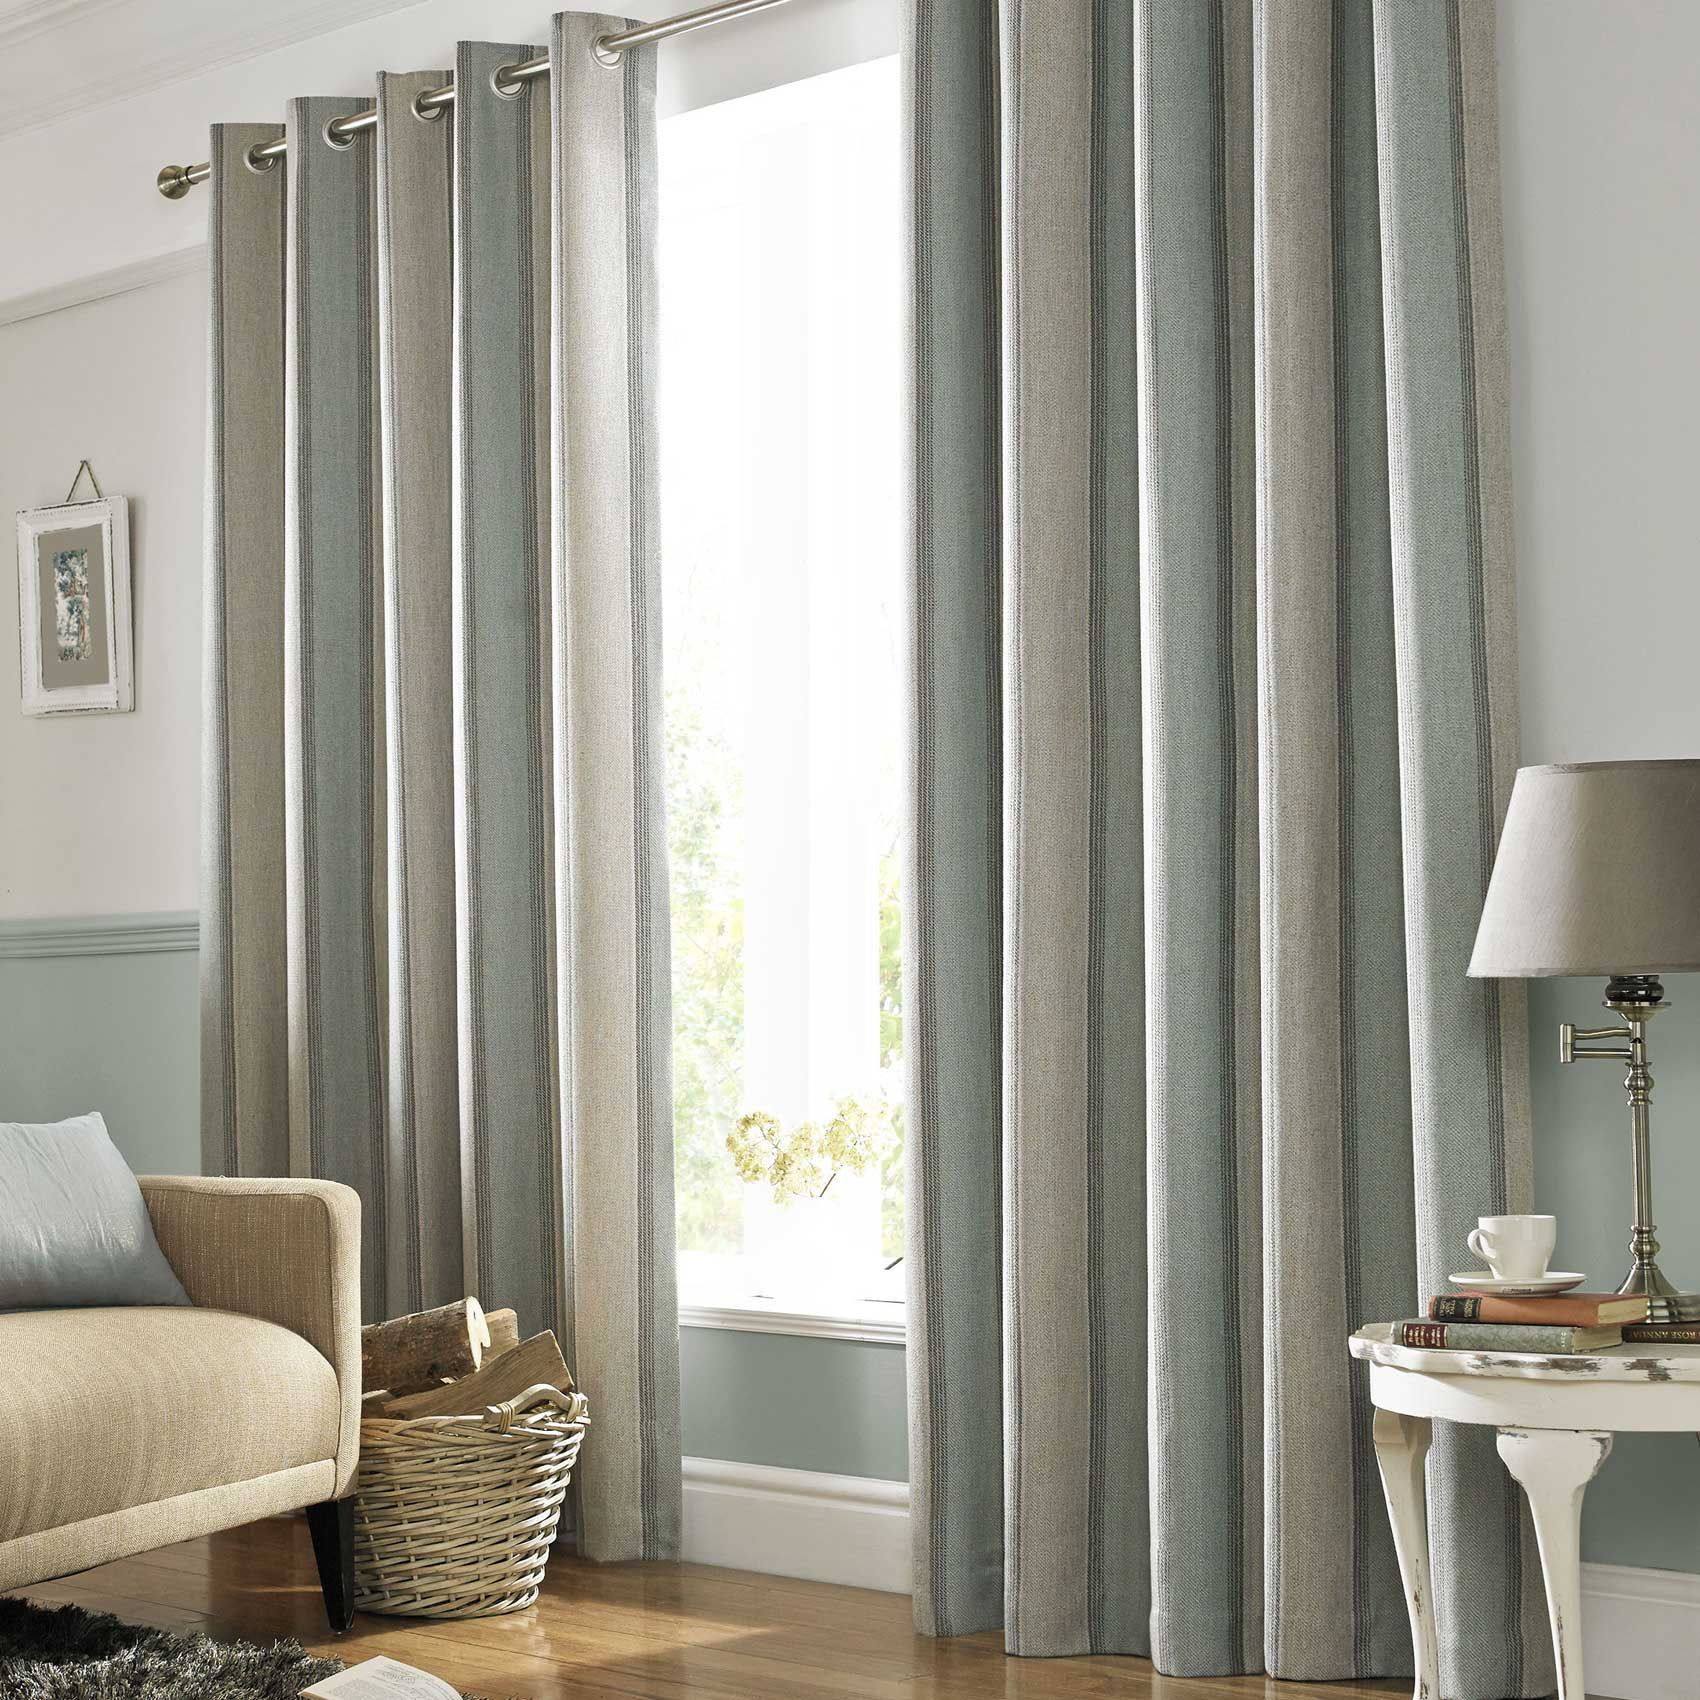 Ashley Wilde Downton Lined Eyelet Curtains